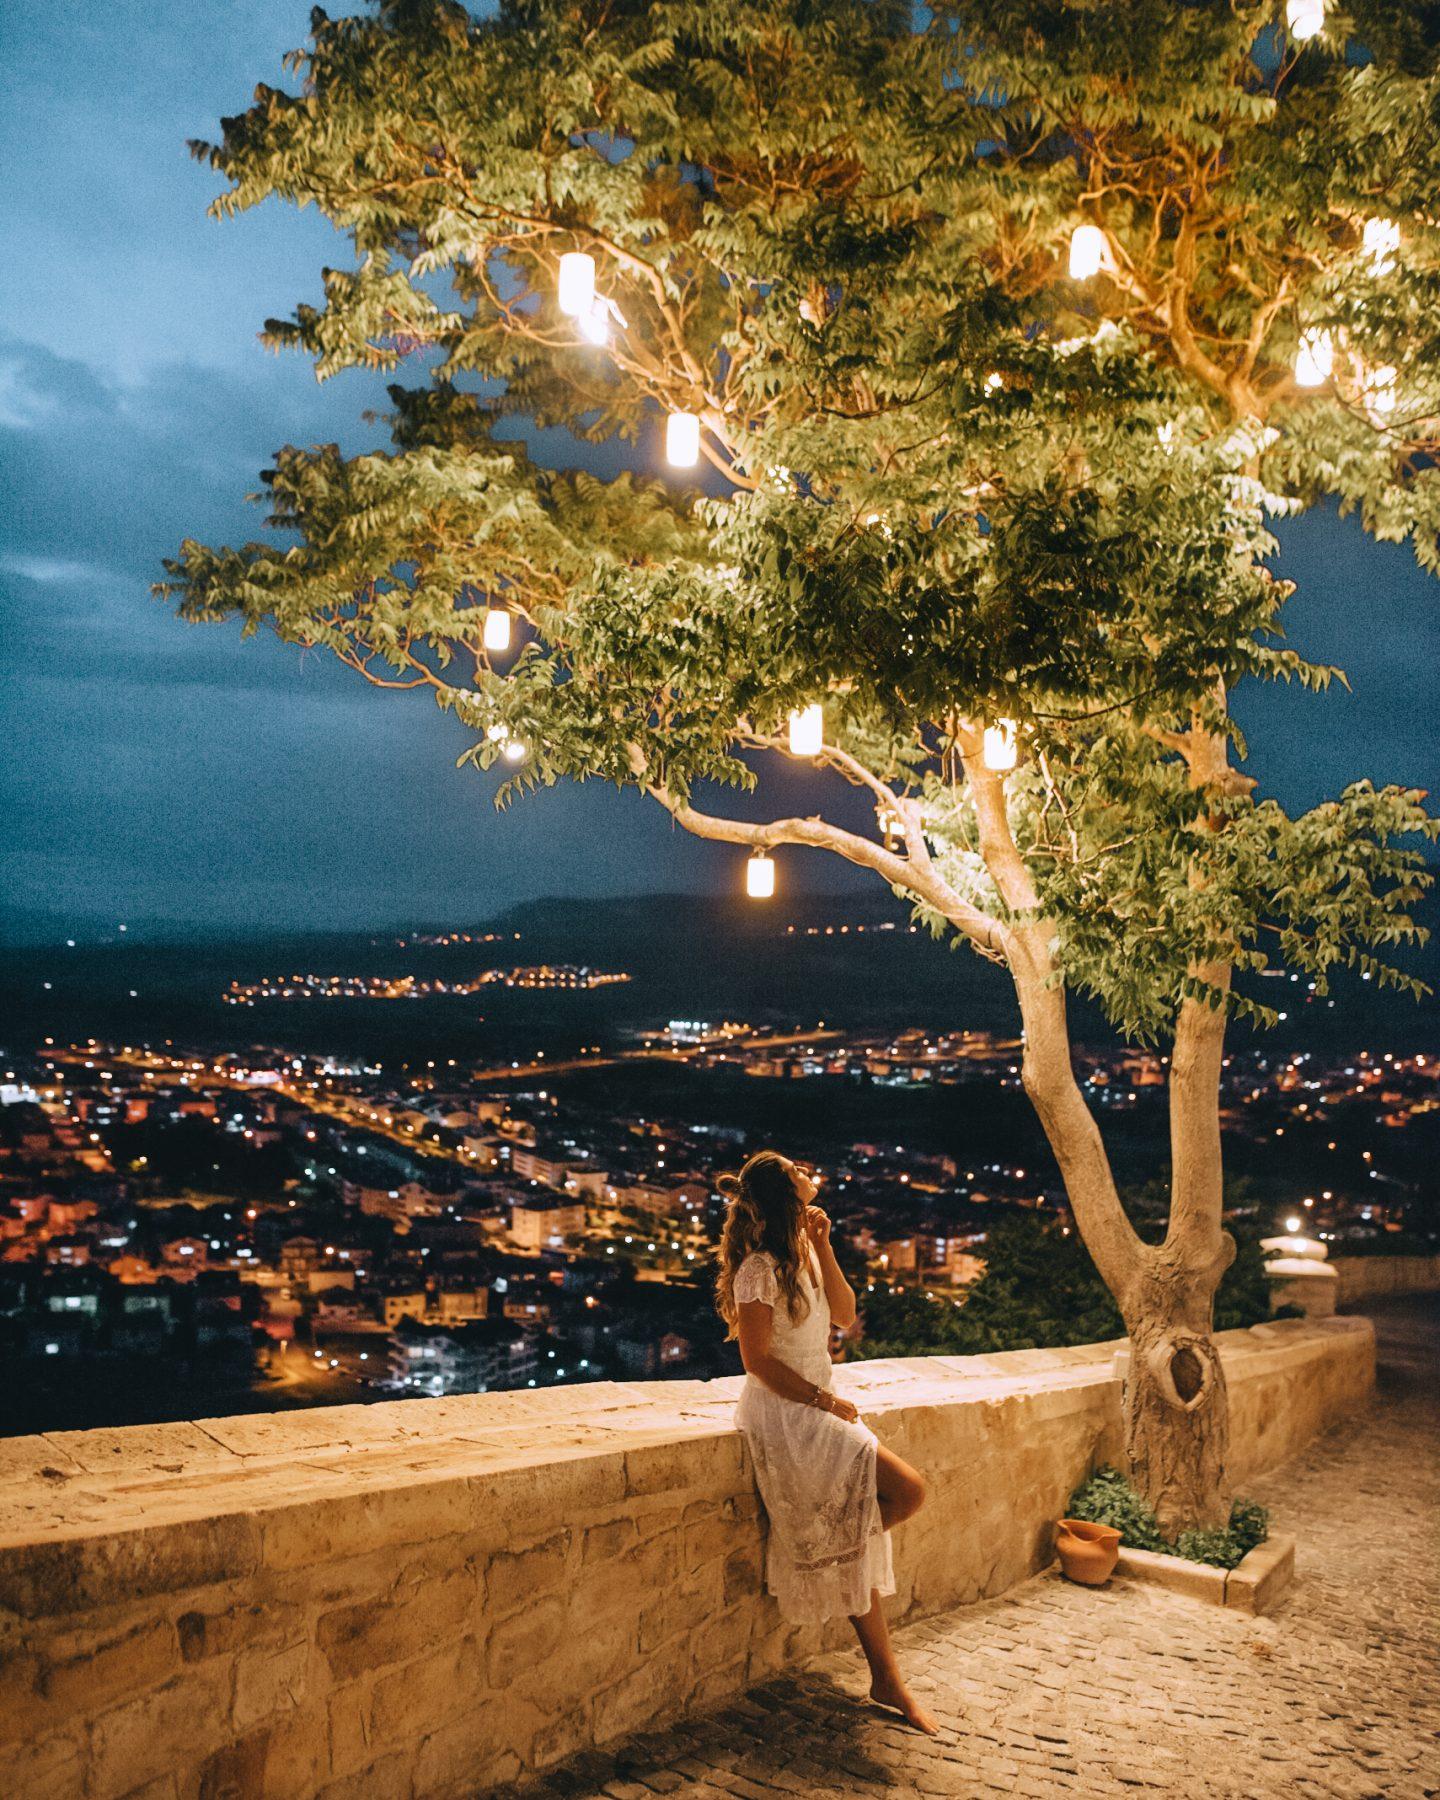 A woman under a lantern lit tree at Kaykapi Premium Caves in Cappadocia